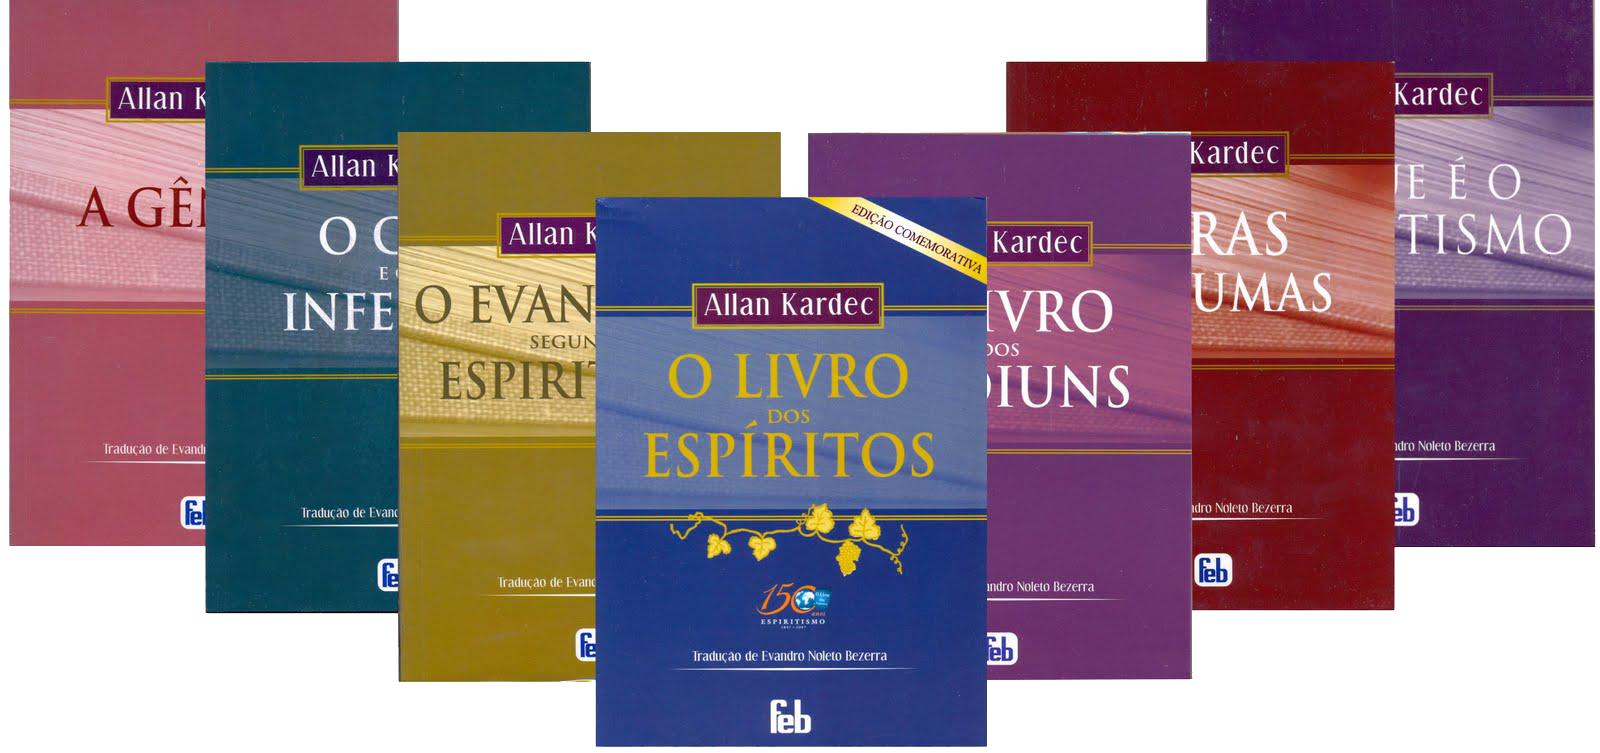 Faça Download das obras de Allan Kardec